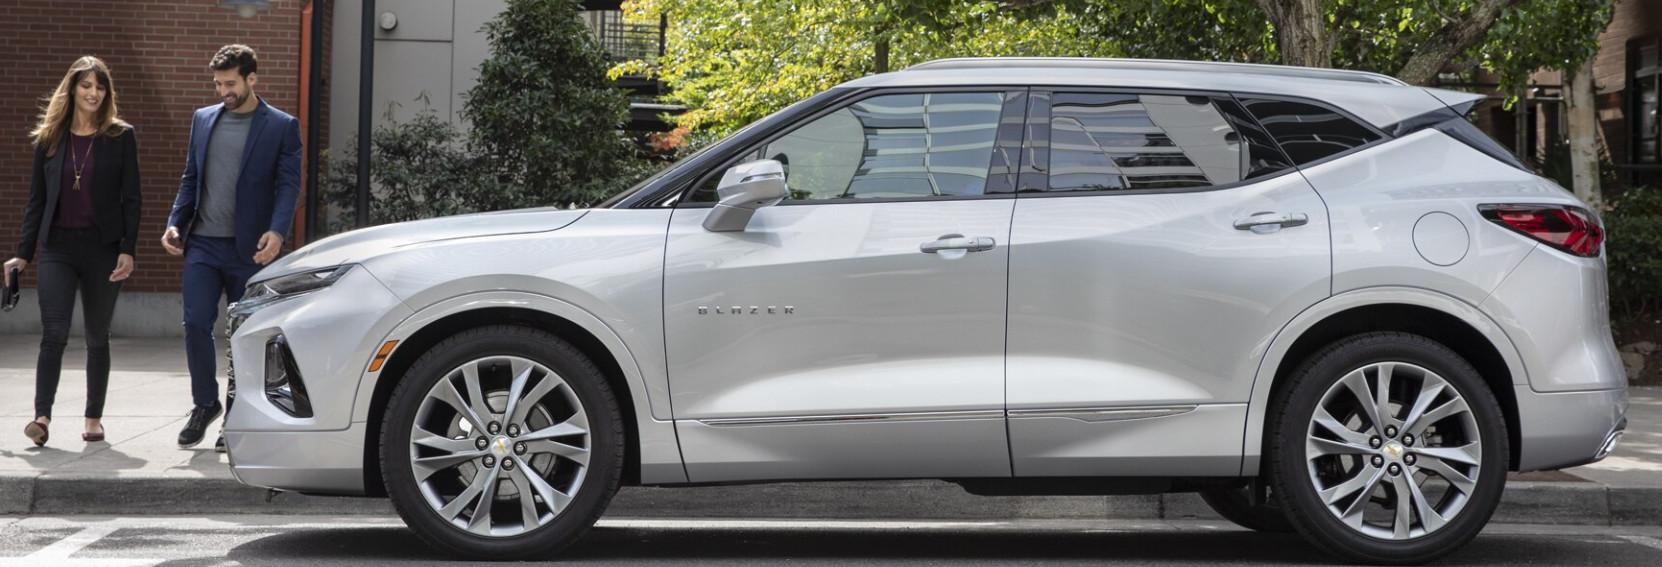 2020 Chevrolet Blazer Leasing near Washington, DC